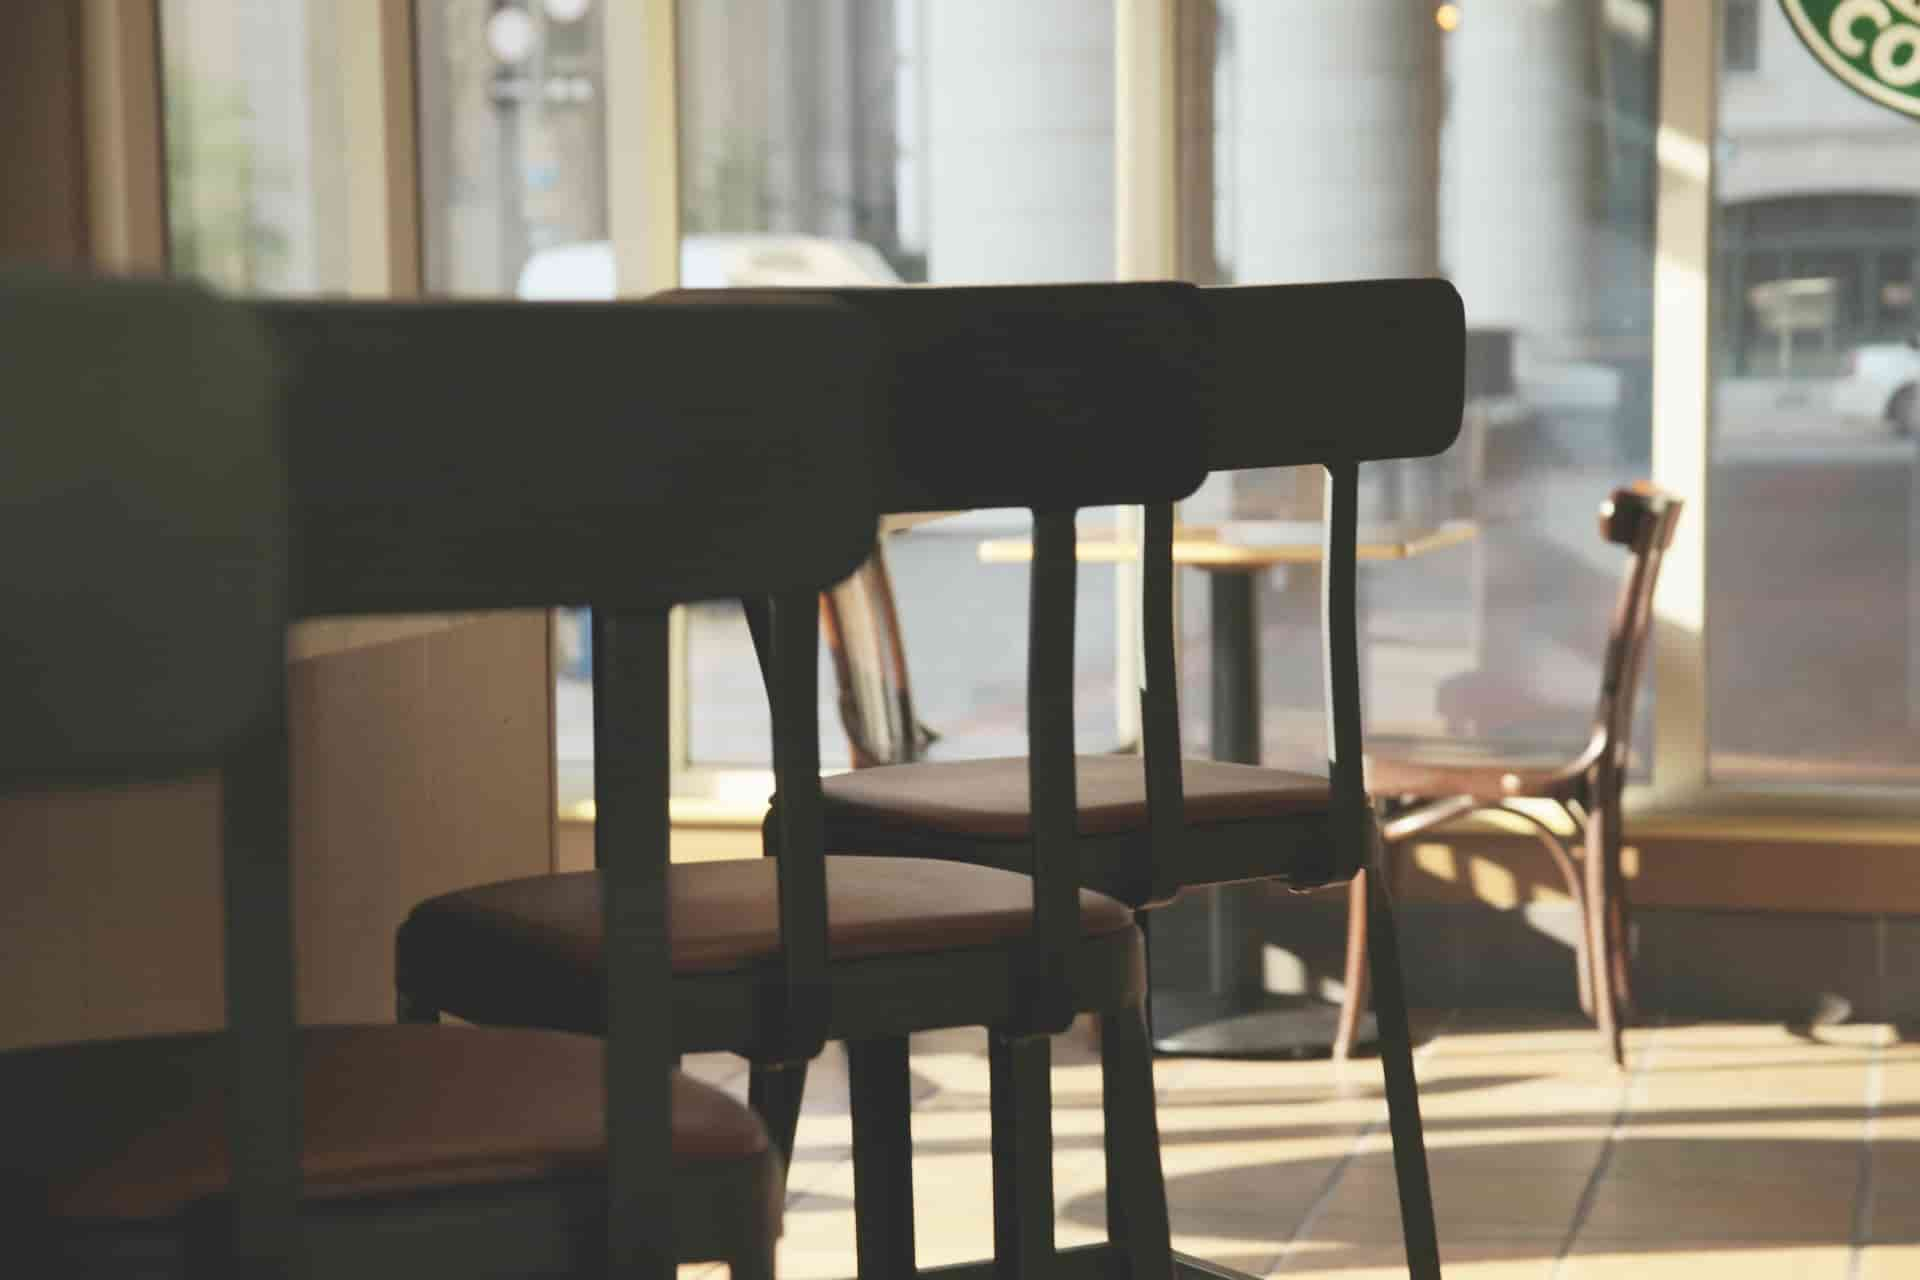 chair-1148930_1920-minのアイキャッチ画像